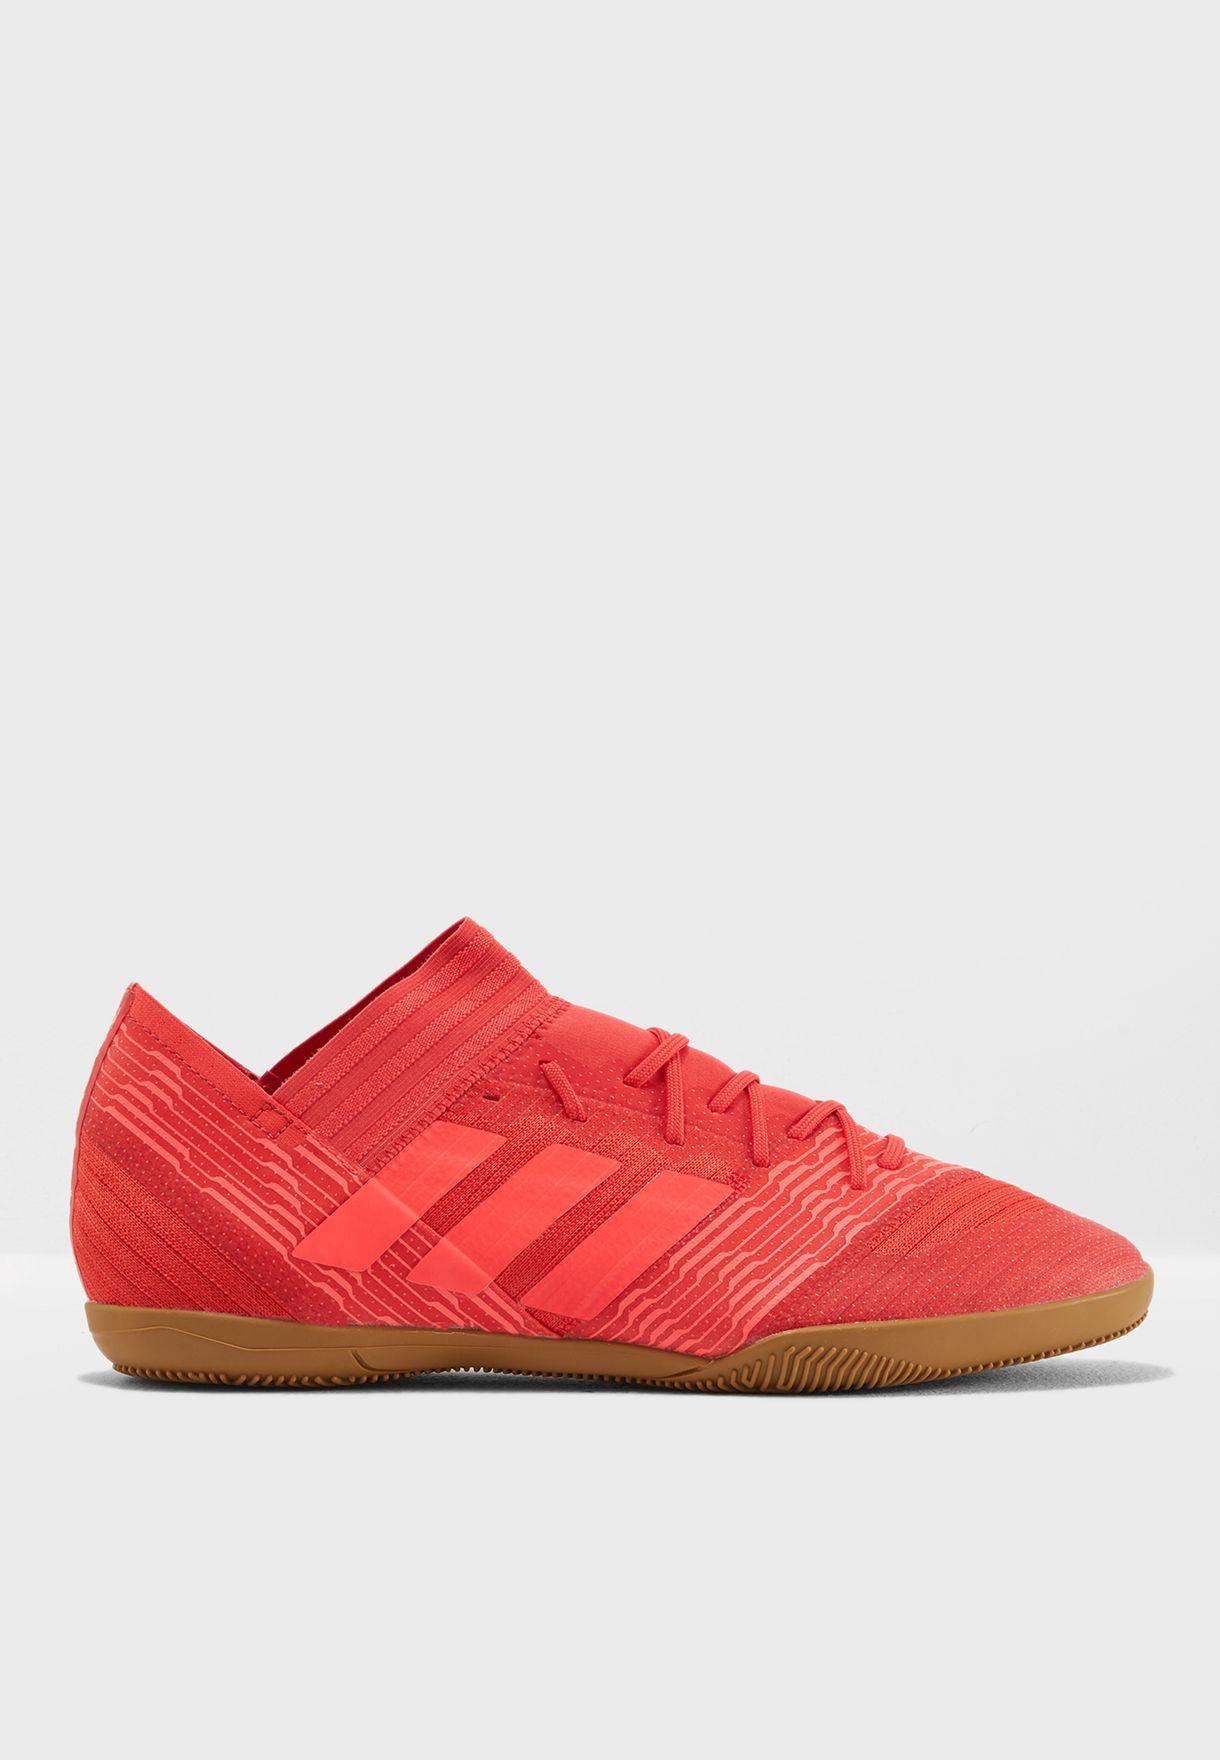 125c91d58 Shop adidas red Nemeziz Tango 17.3 IN CP9112 for Men in Saudi ...